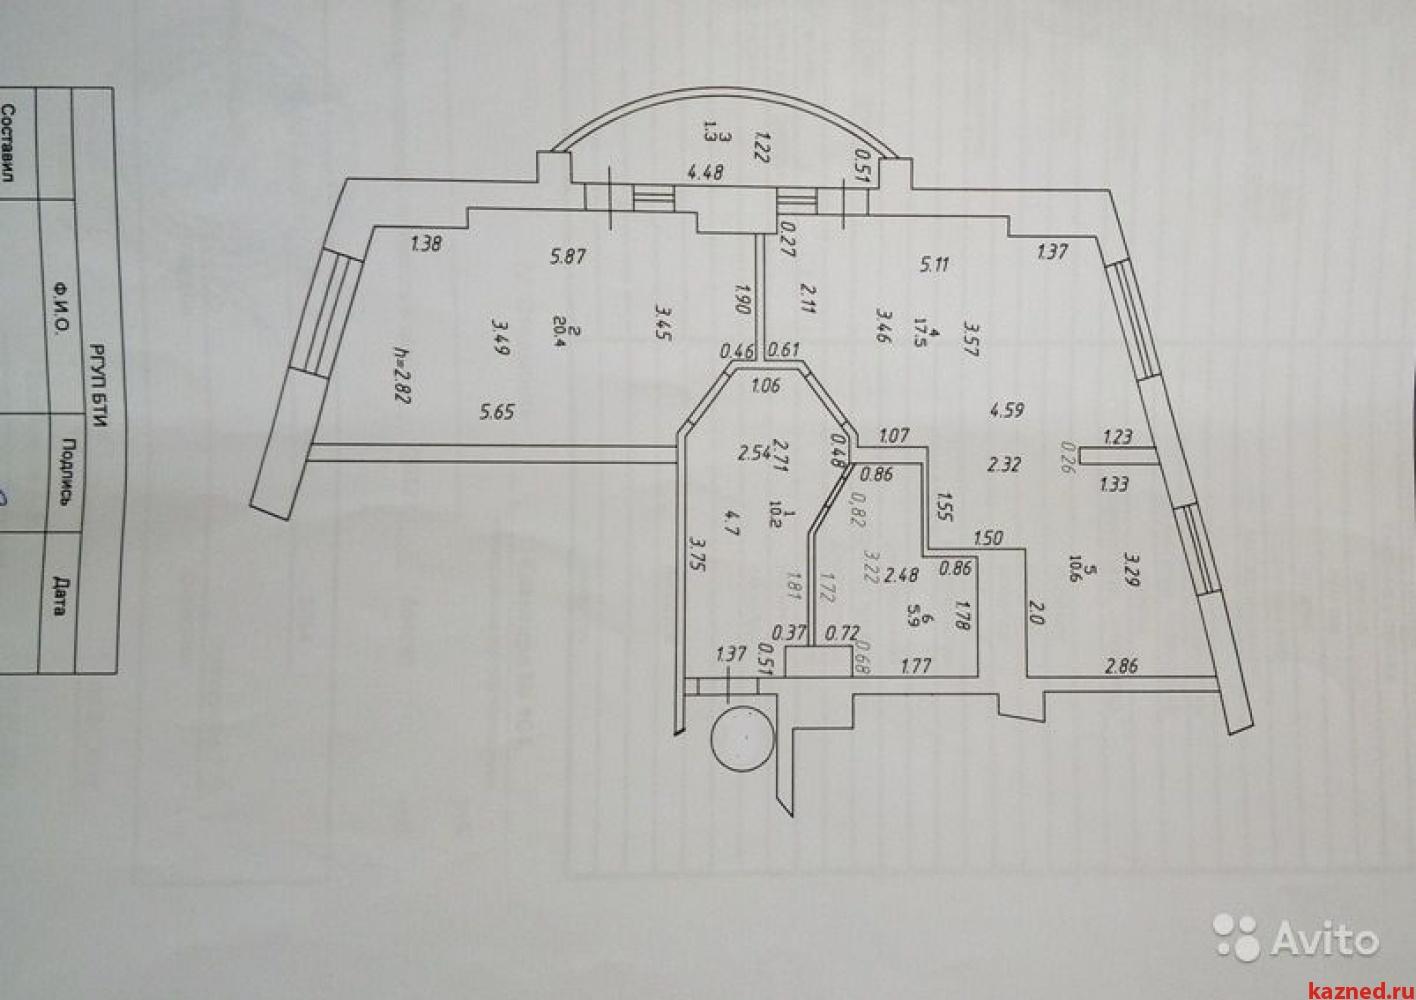 Продажа 2-к квартиры Юлиуса Фучика, 2Б, 66 м2  (миниатюра №12)